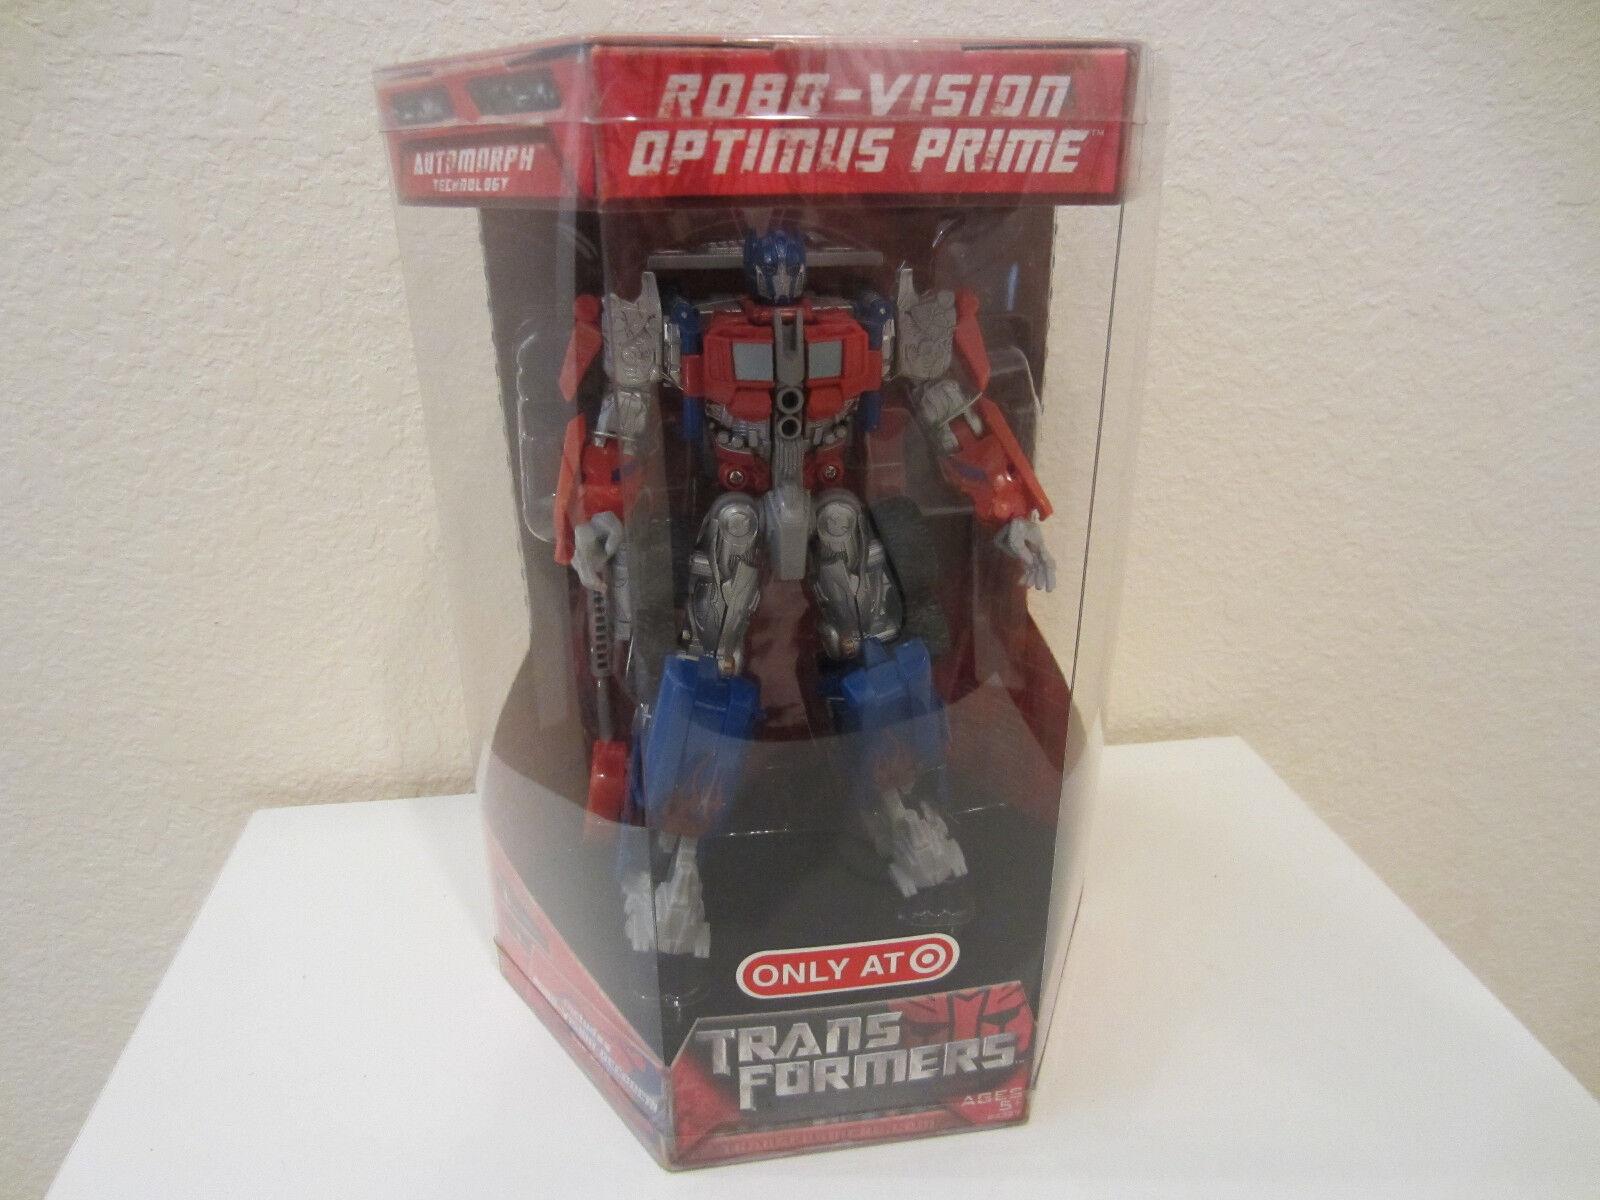 Transformers 2007 movie Atobot Robo-Vision Optimus Prime Target exl Limited MISB